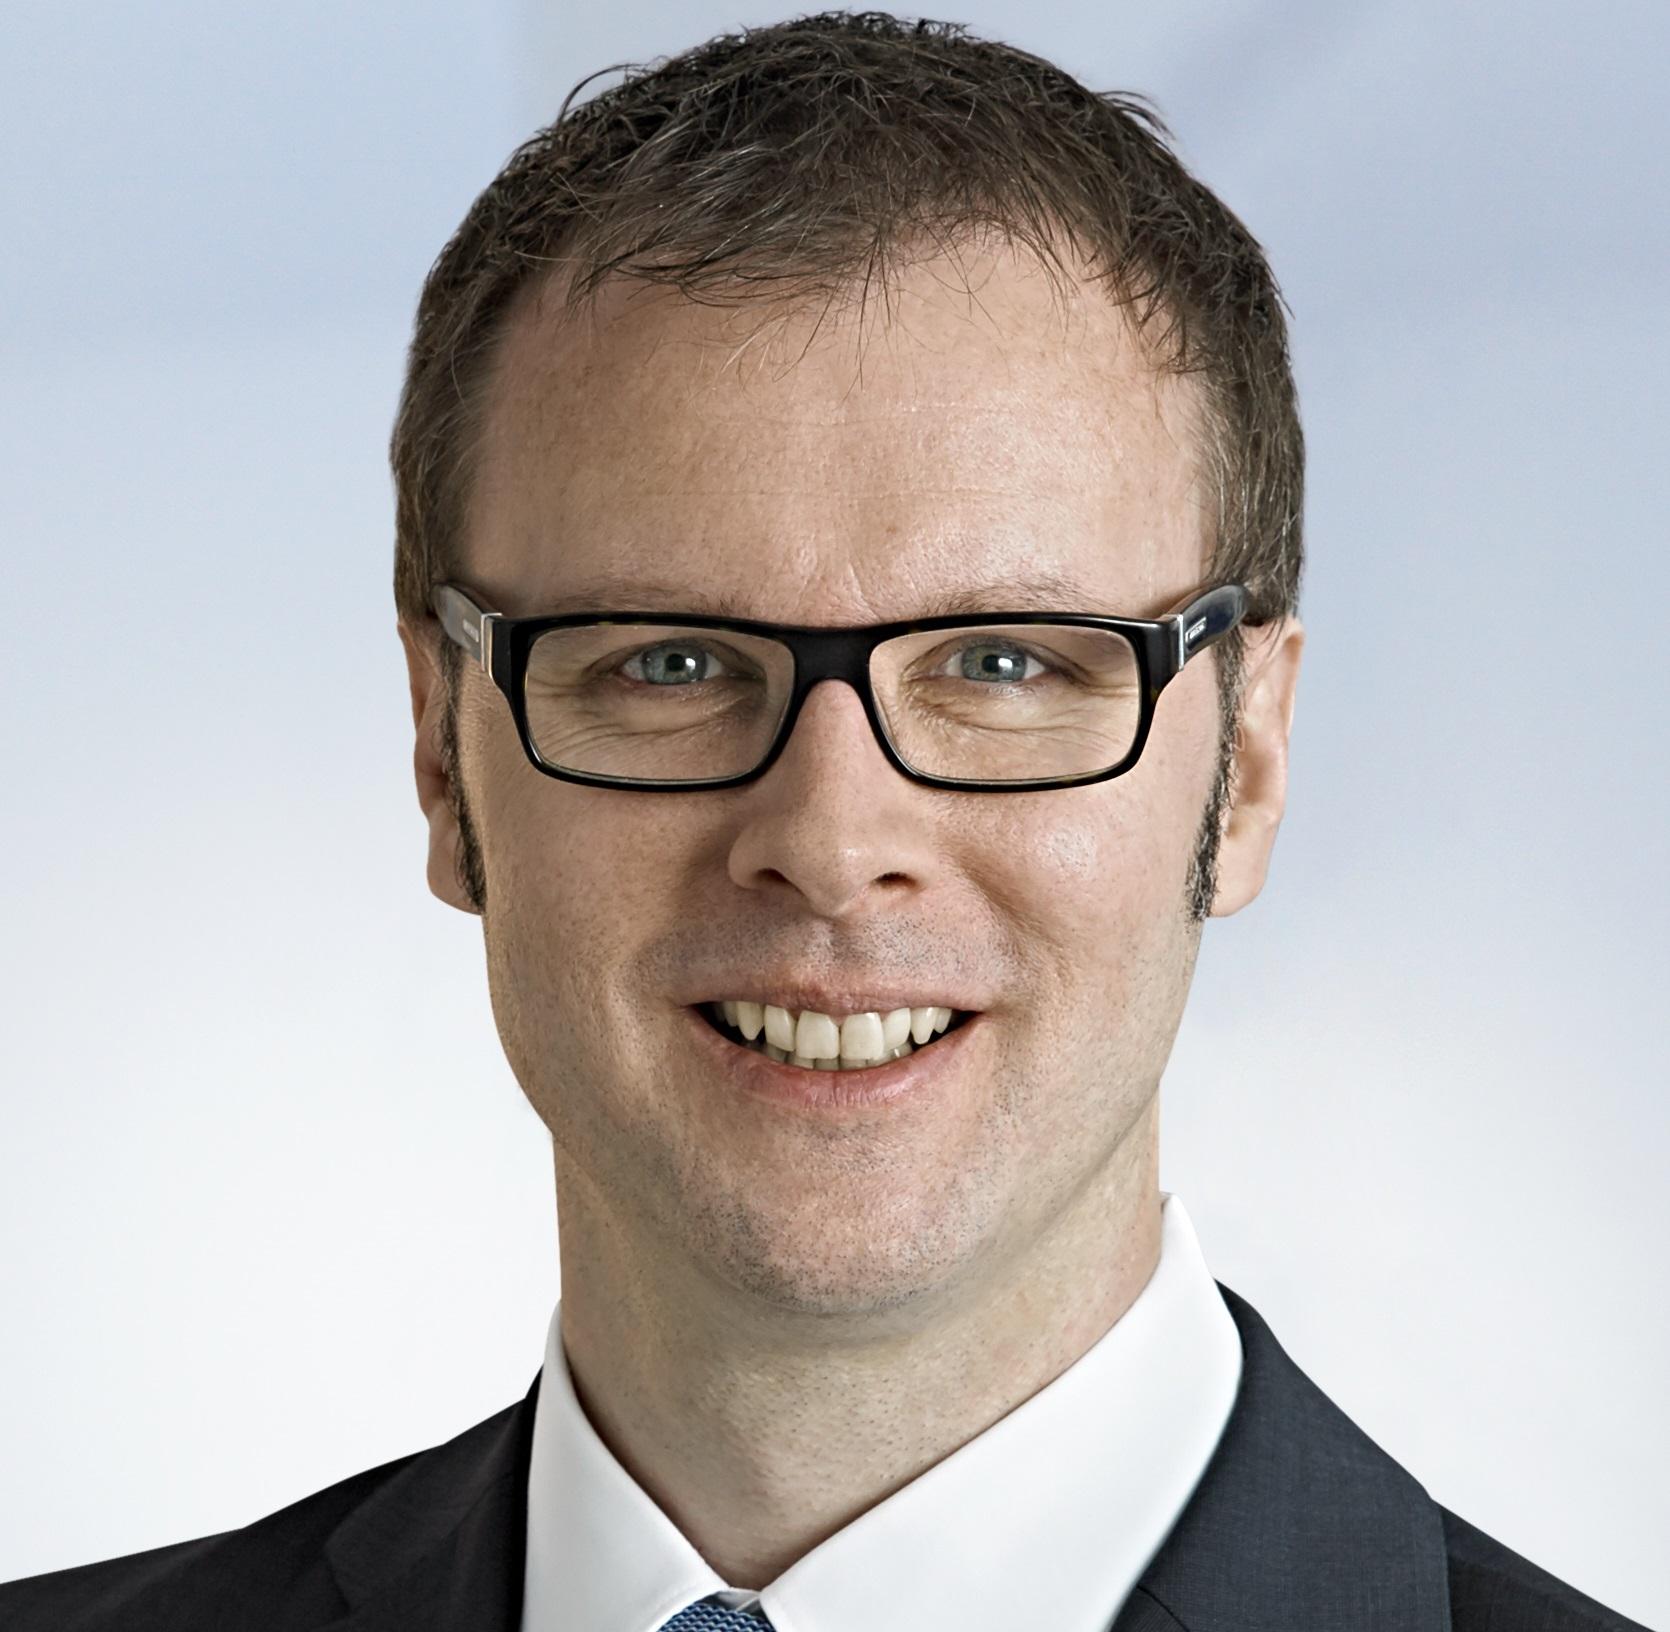 Stahlschmidt Ruediger KomChef Alloheim Sen Residenzen c BorisZorn